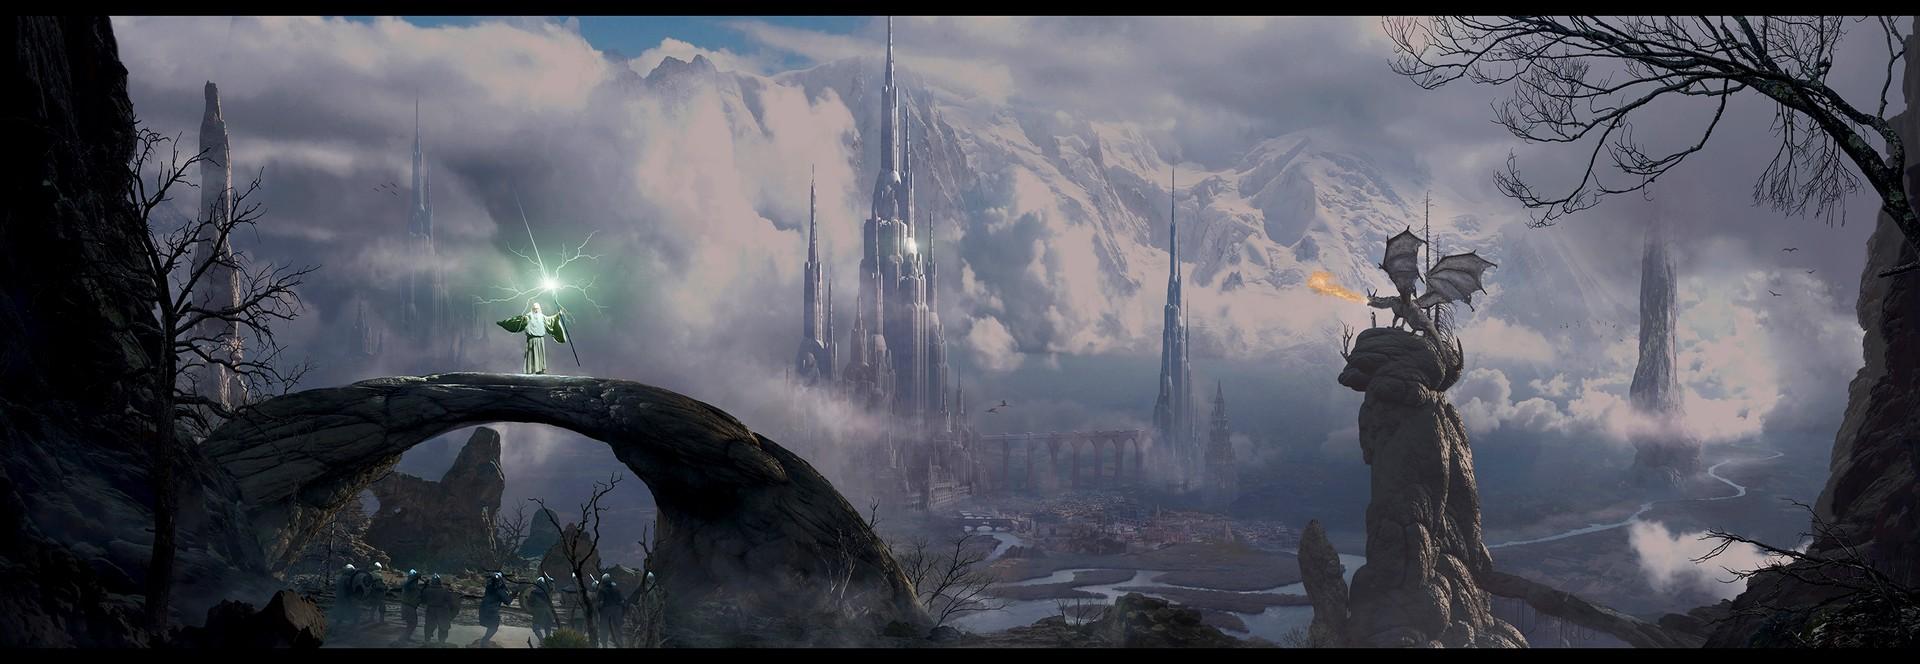 Richard_Fantasy Kingdom